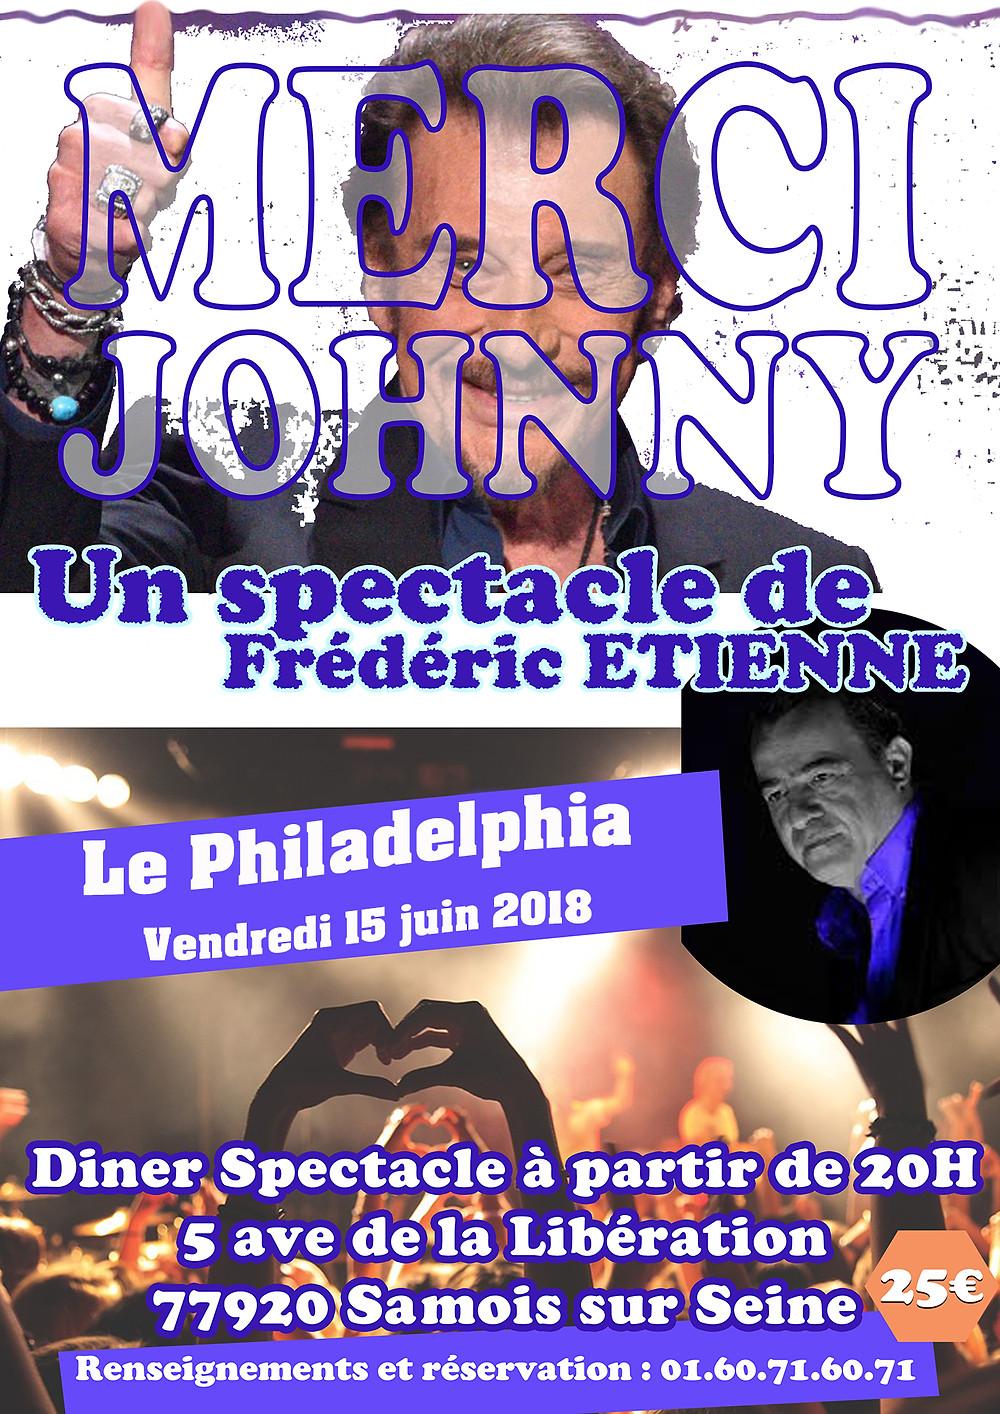 Spectacle Johnny Hallyday, le Philadelphia à Samois sur Seine